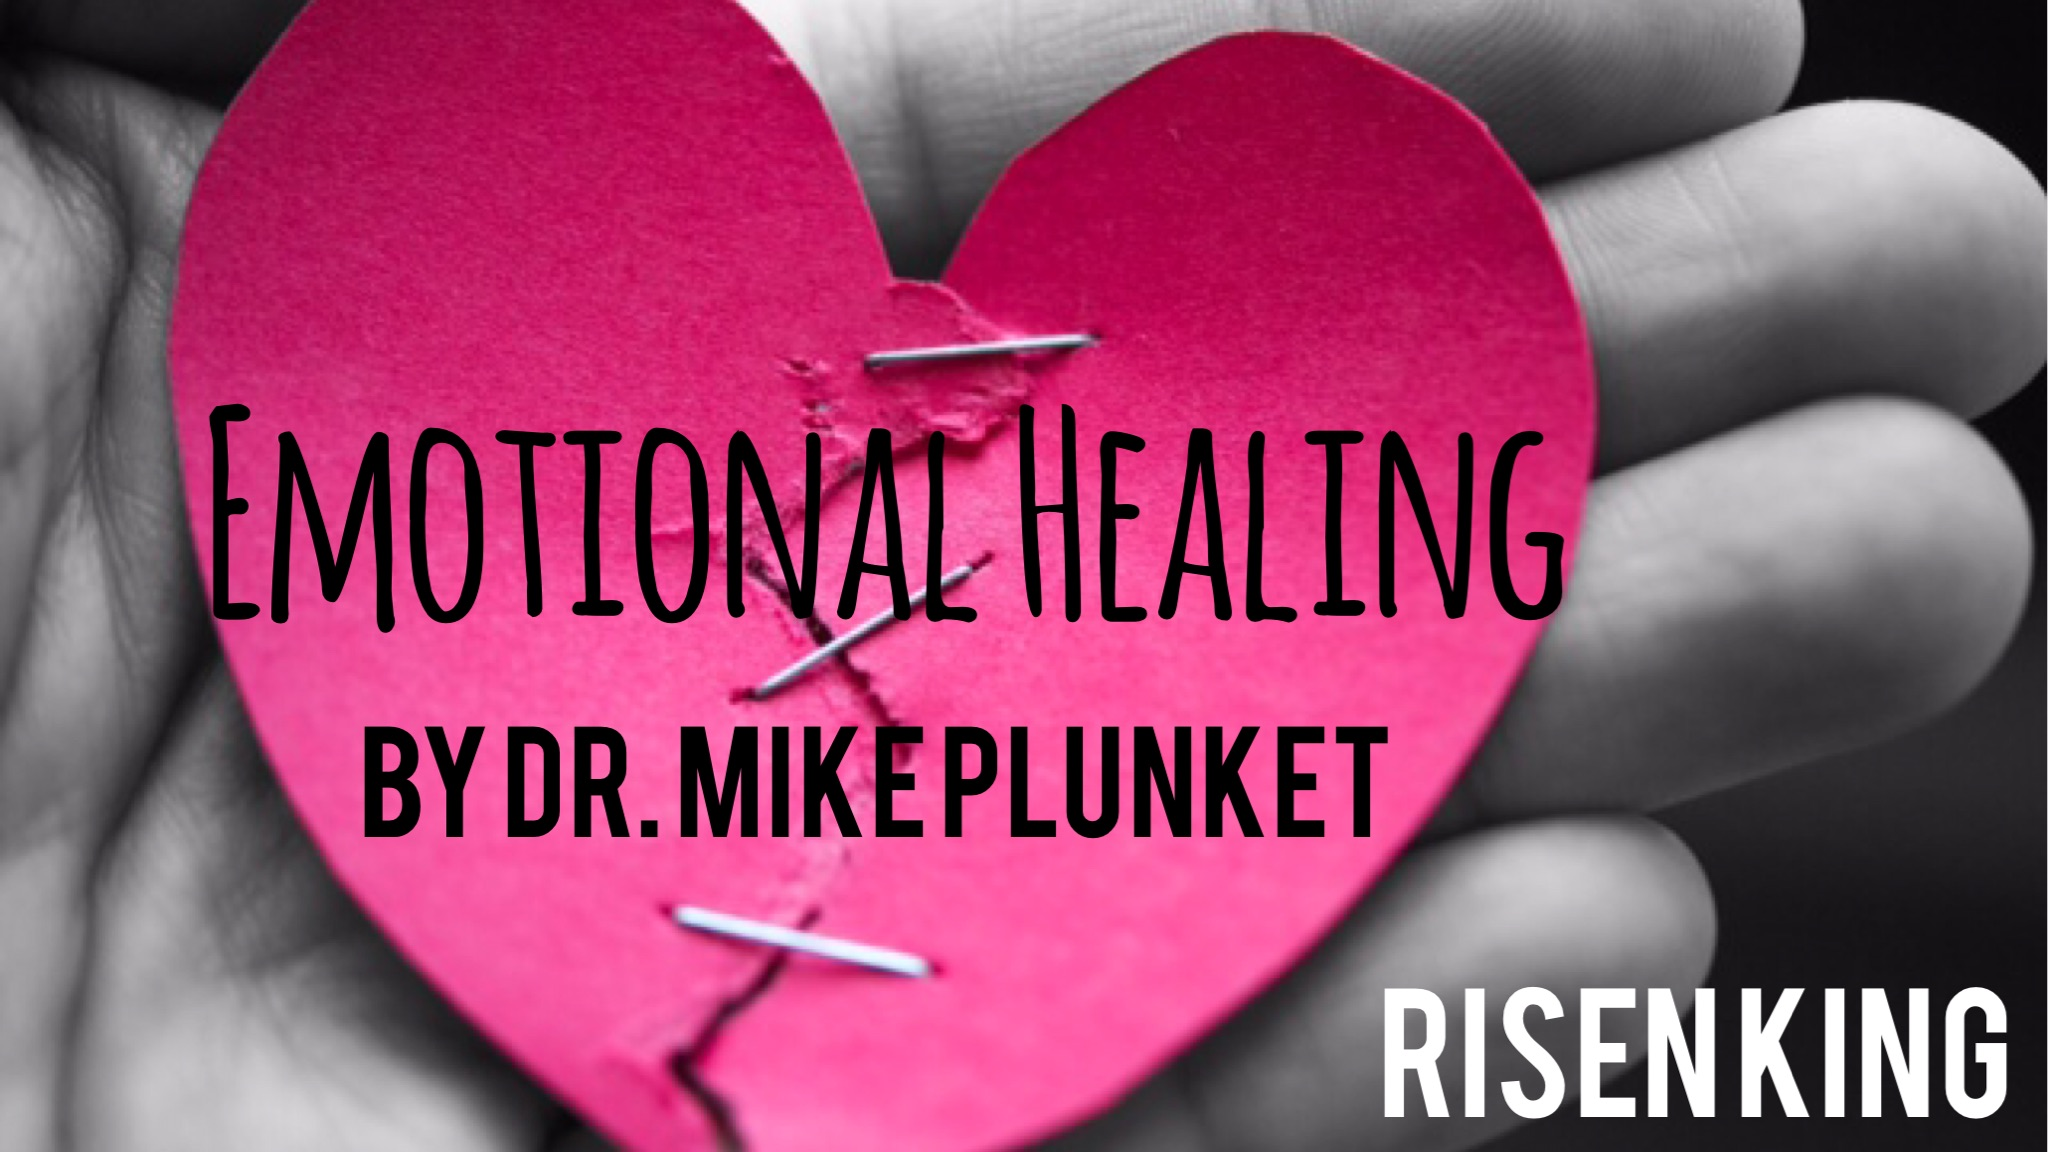 Emotional Healing Video Course